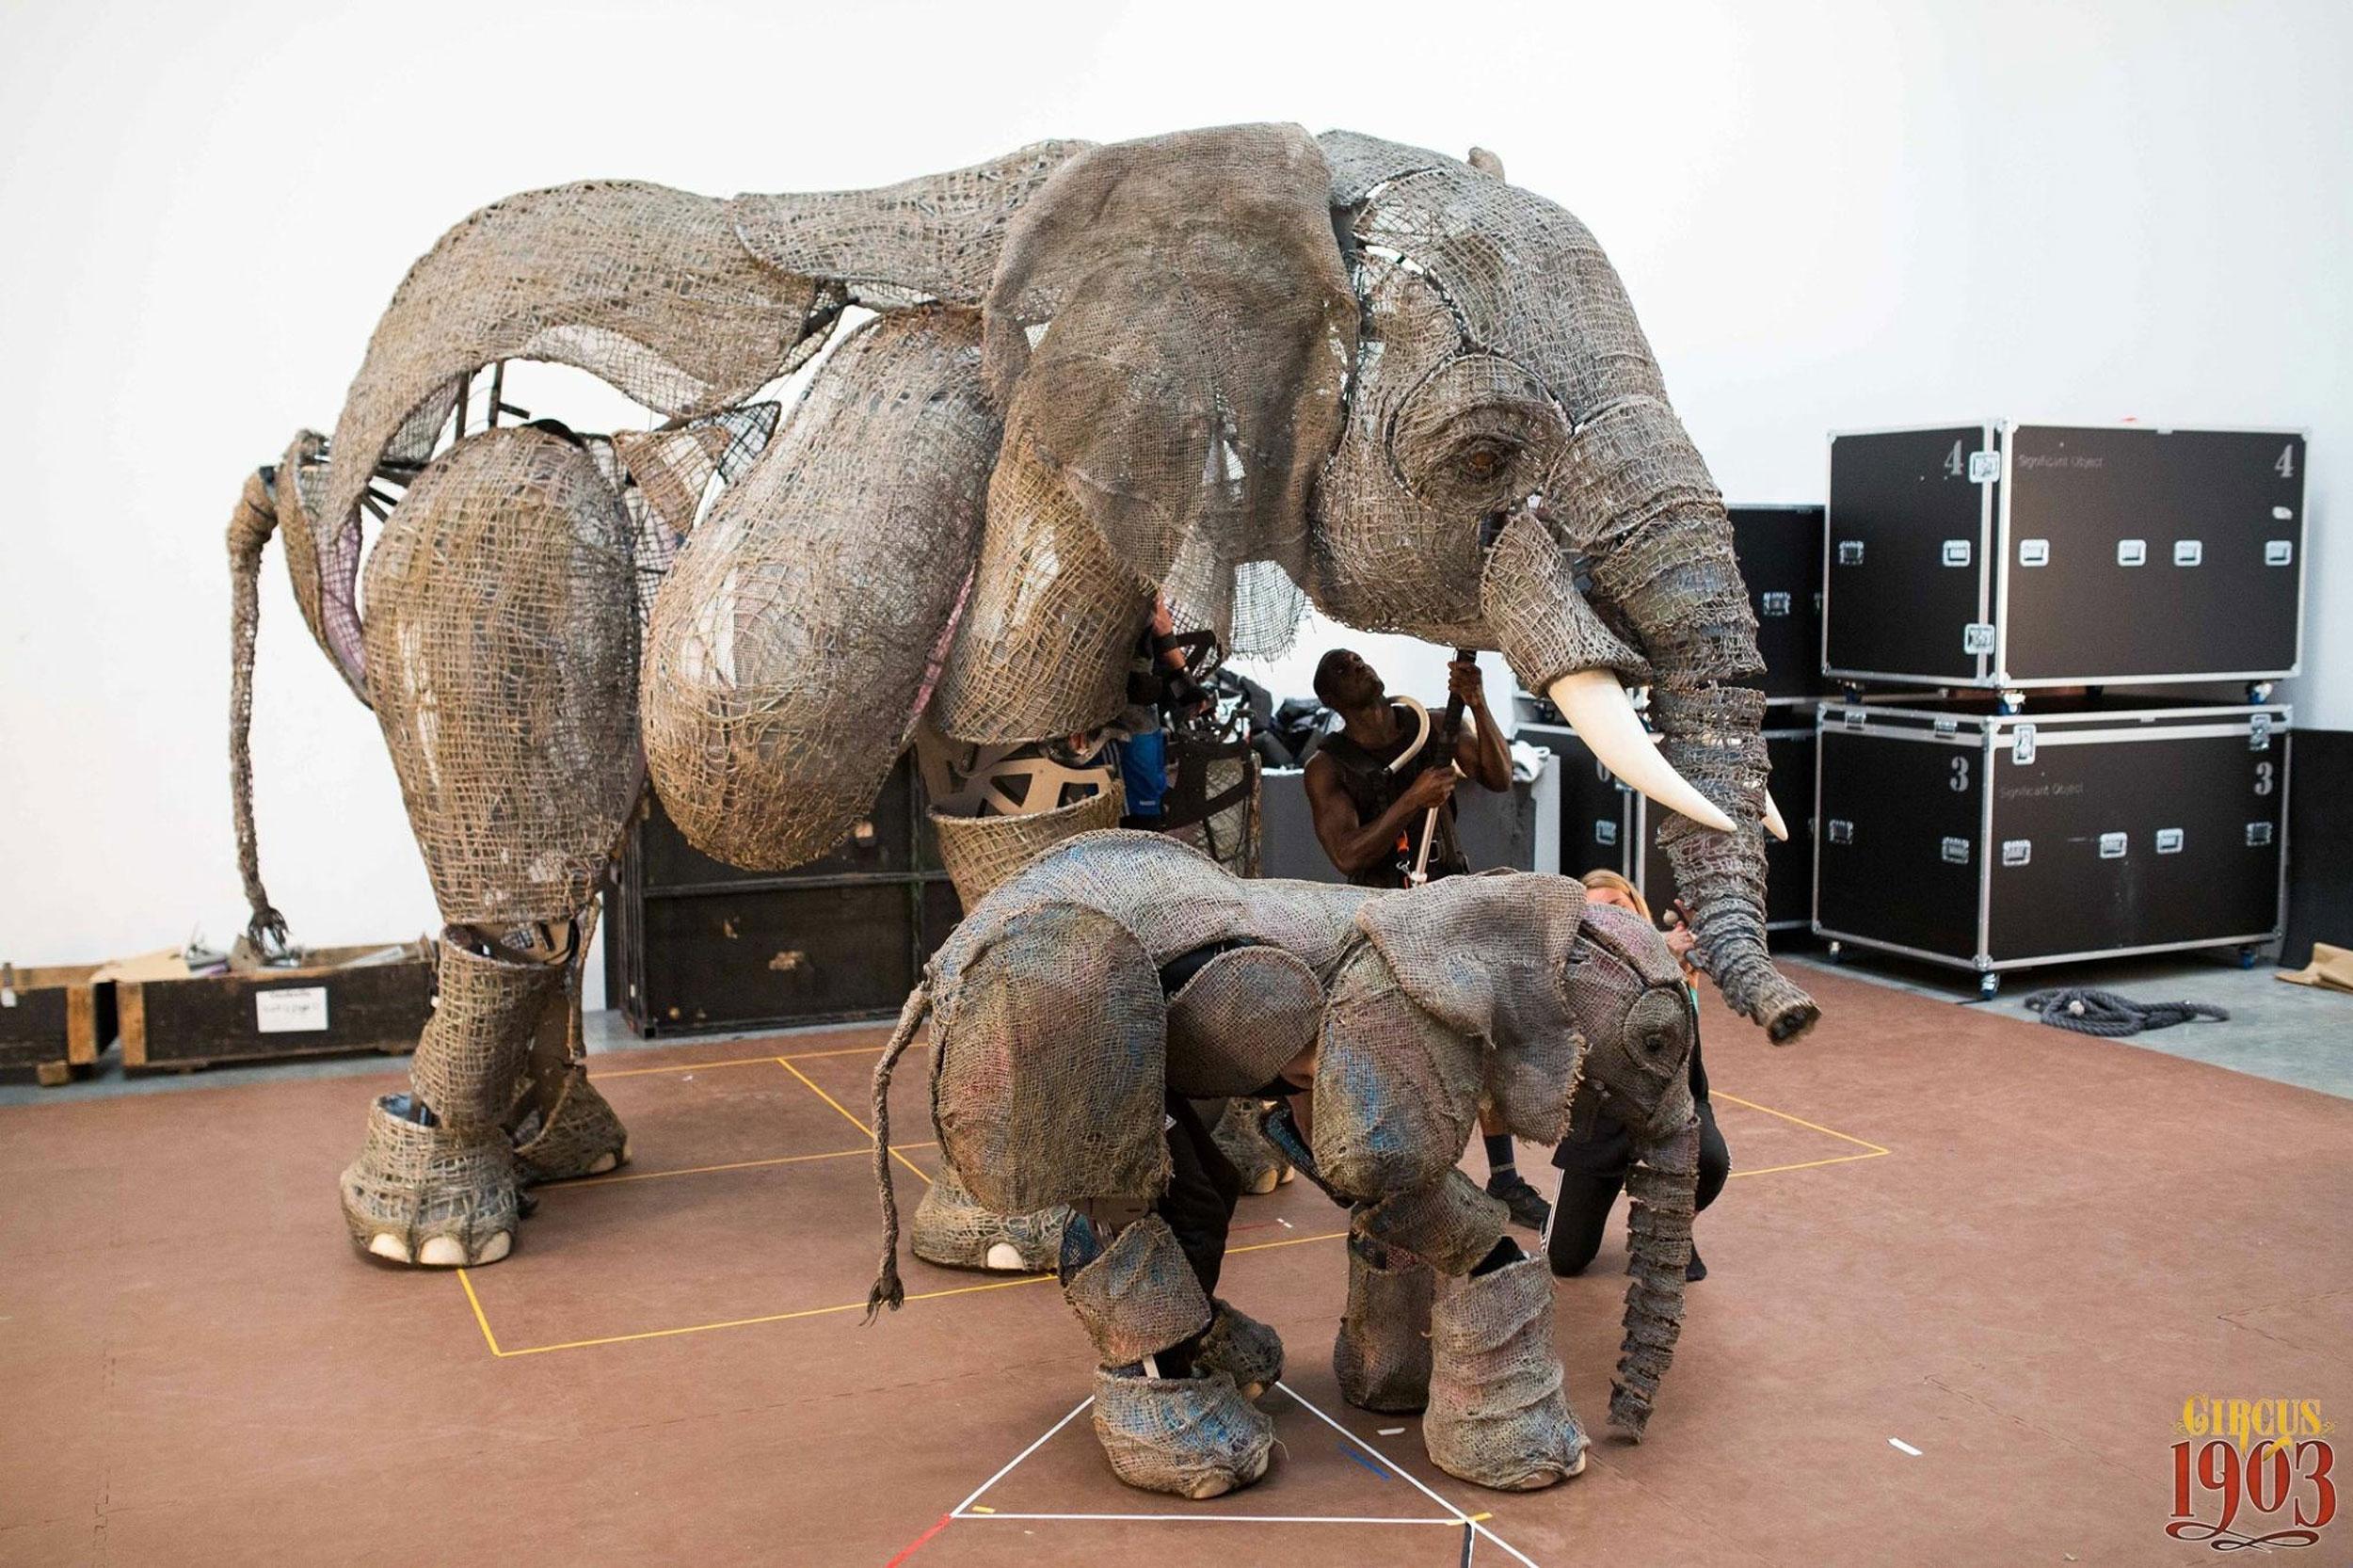 elephants-rehearsal-circus1903.jpg